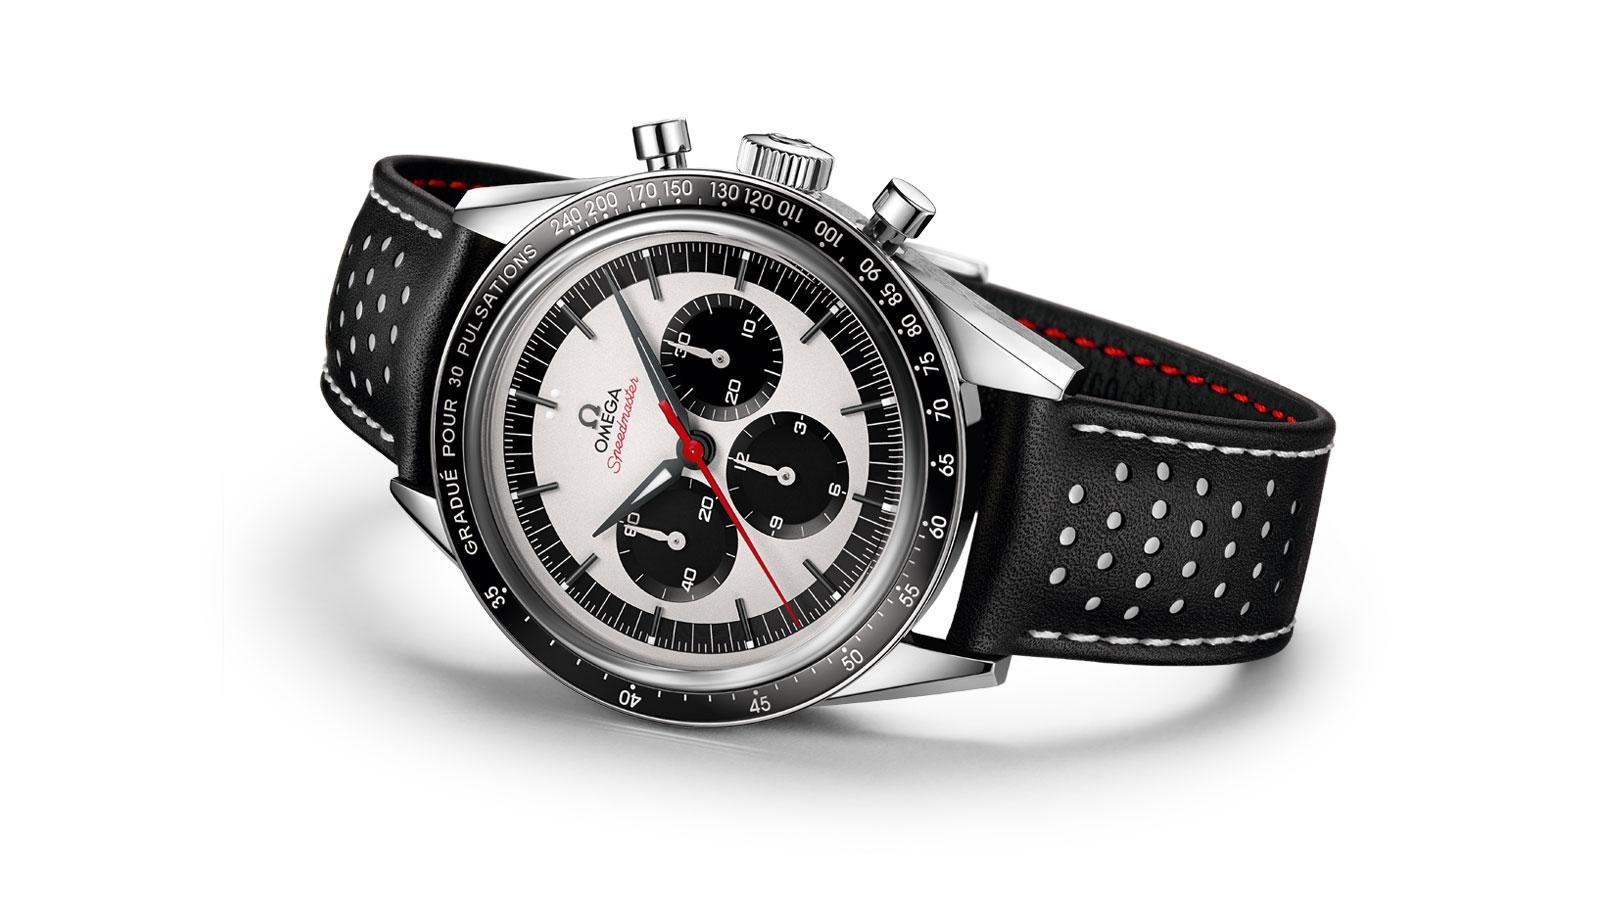 omega-speedmaster-moonwatch-31132403002001-gallery-3-large.jpg